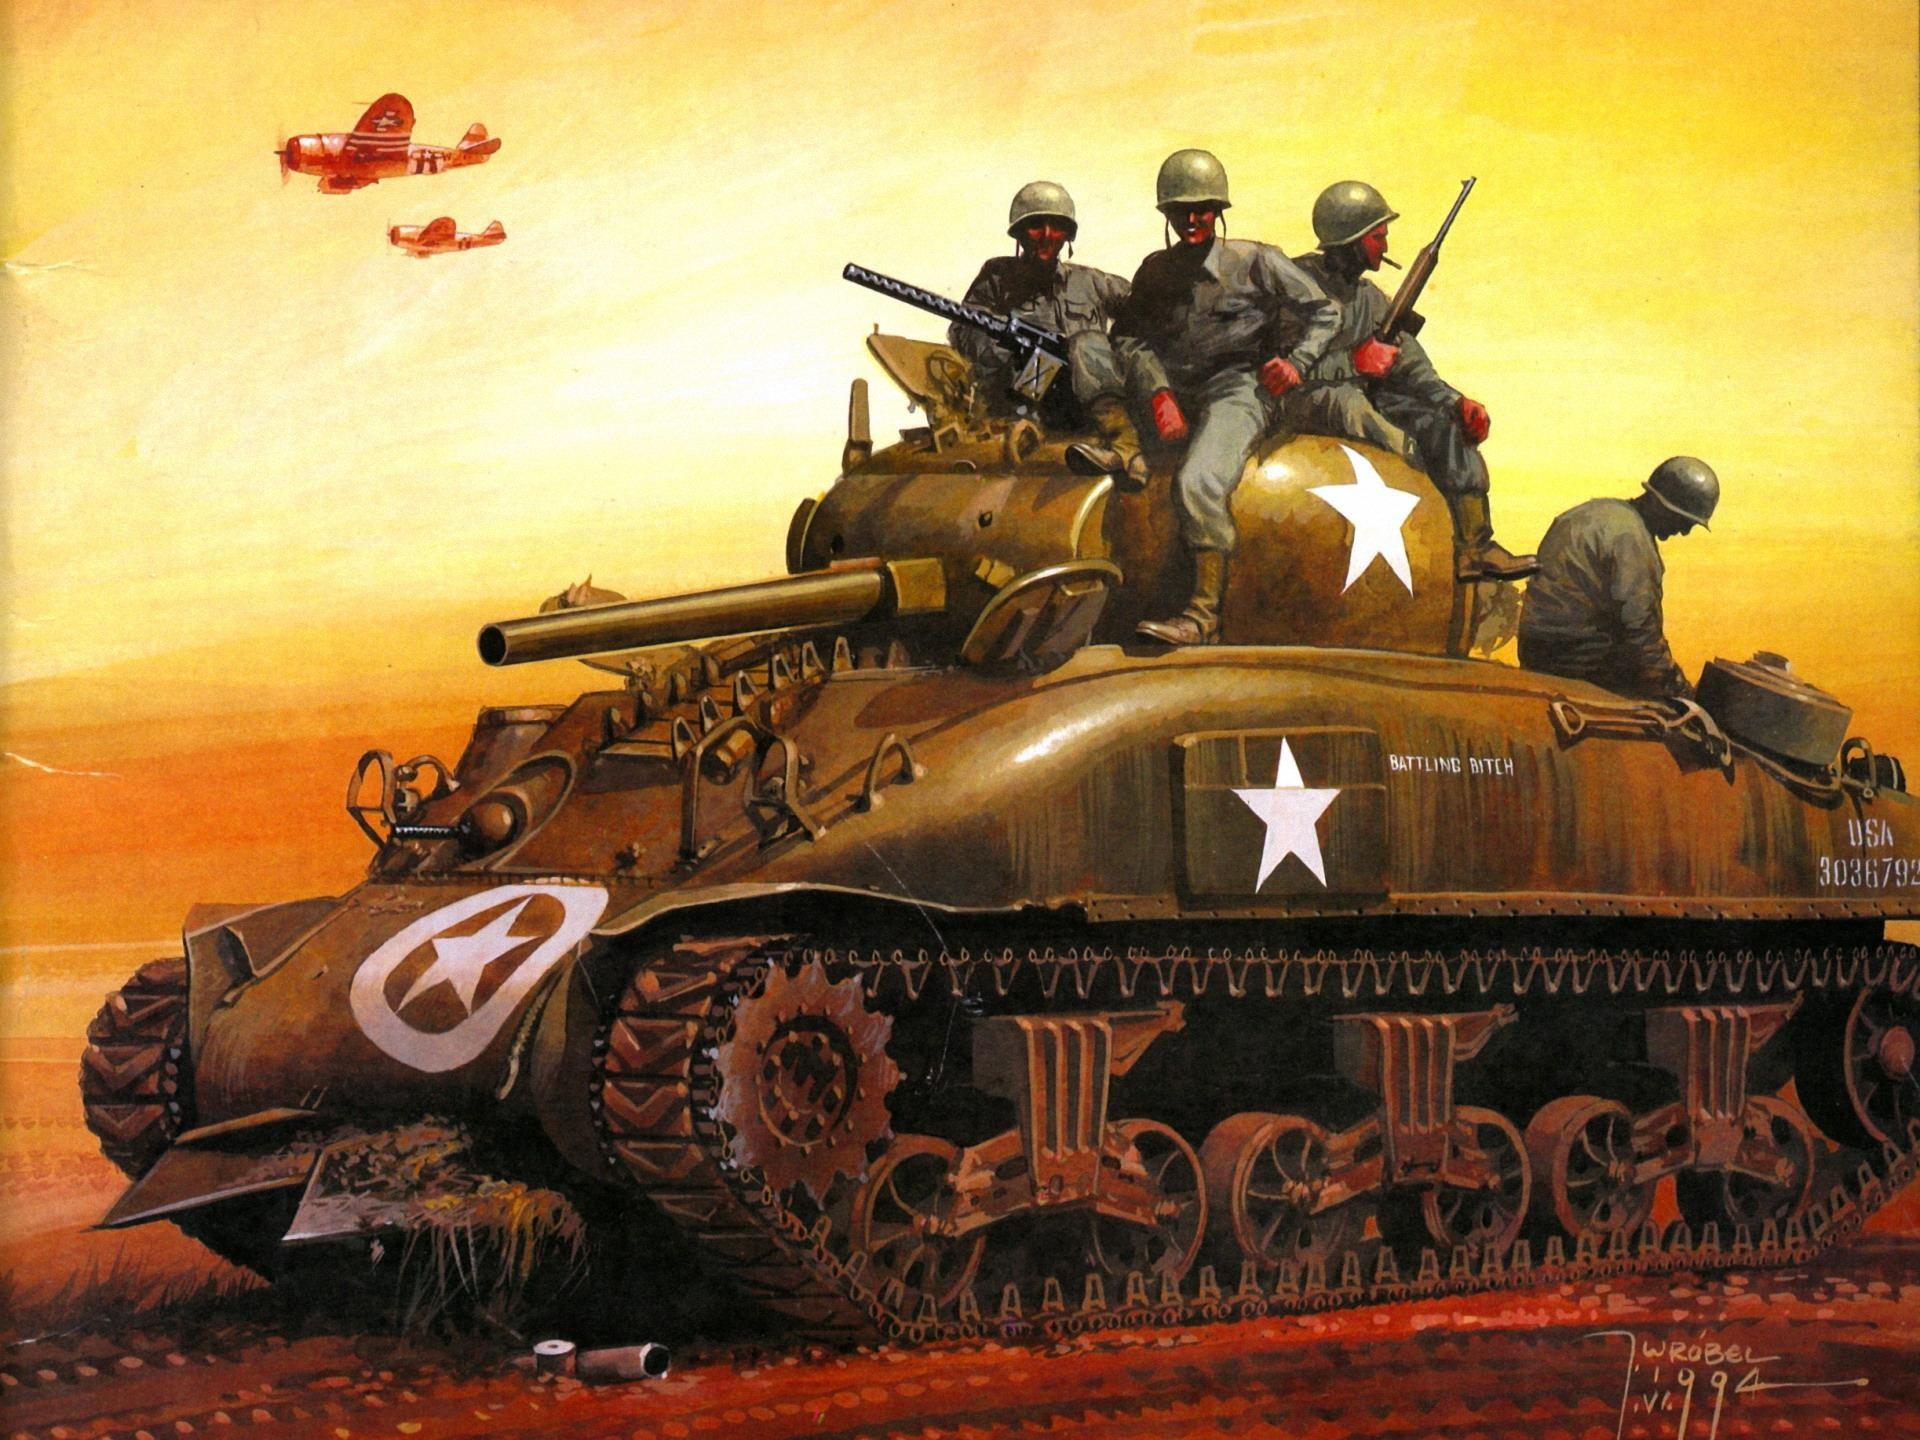 Res: 1920x1440, Download Original Wallpaper Category:military ...